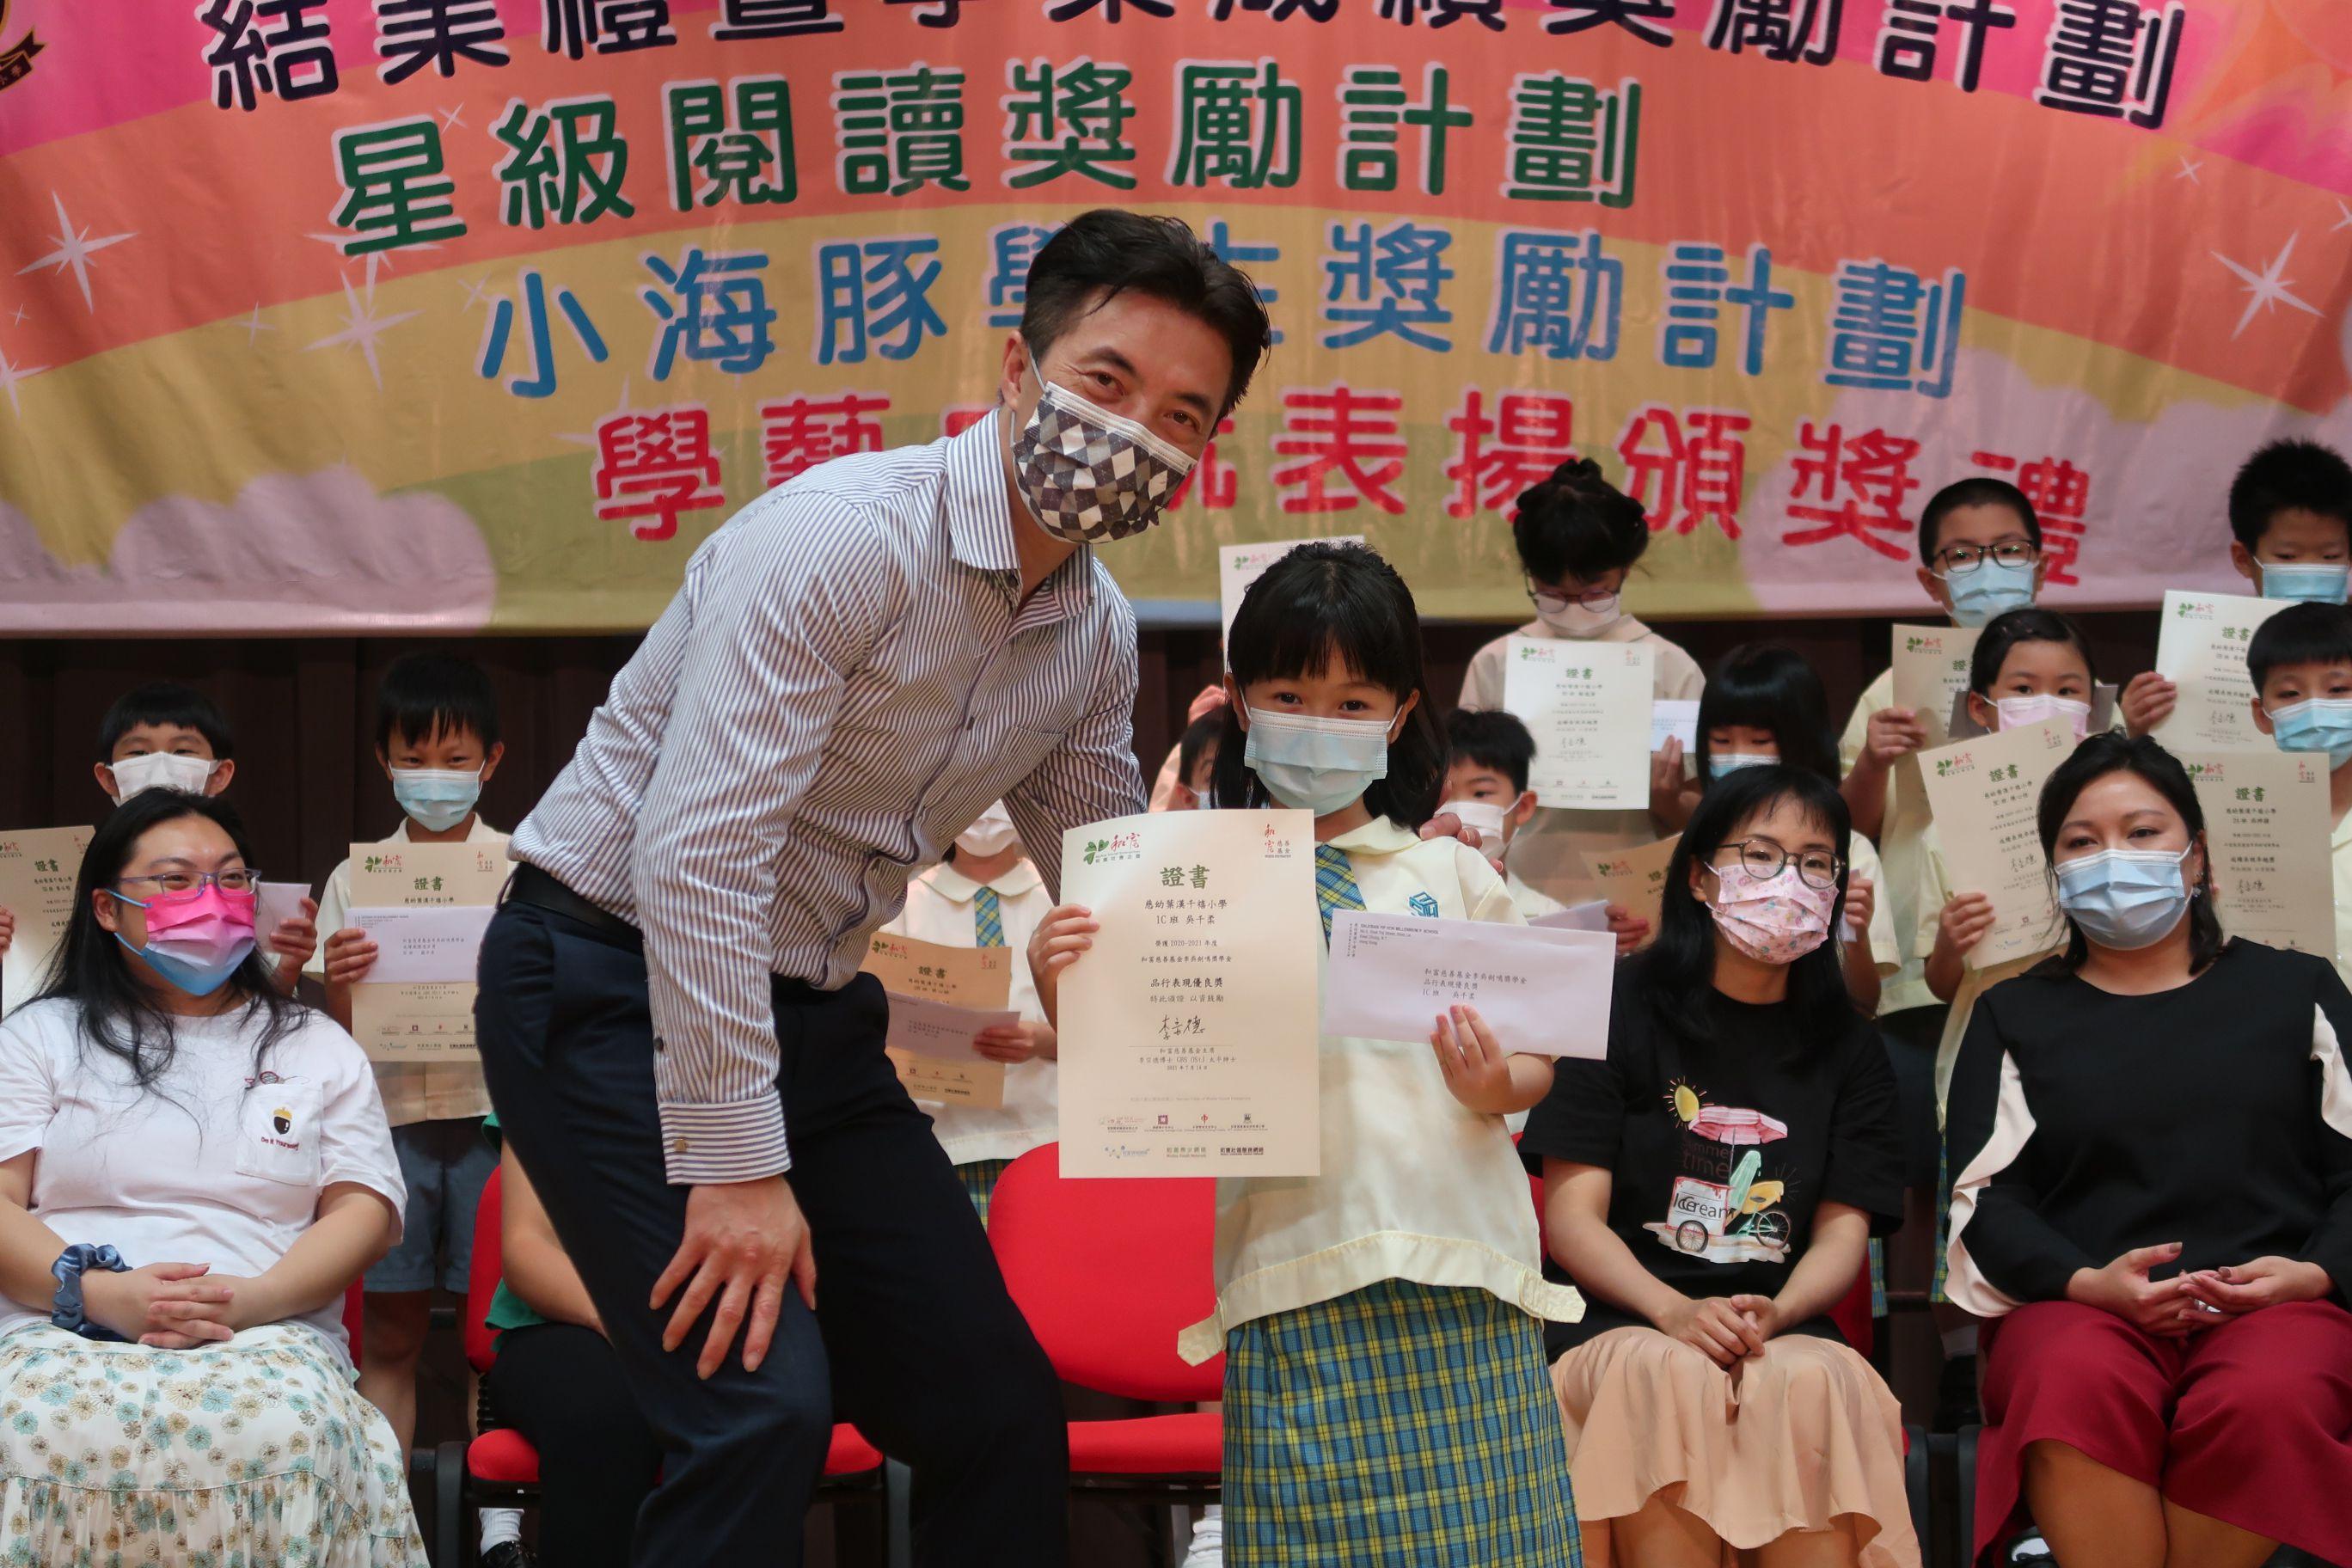 https://syh.edu.hk/sites/default/files/img_5950_1.jpg